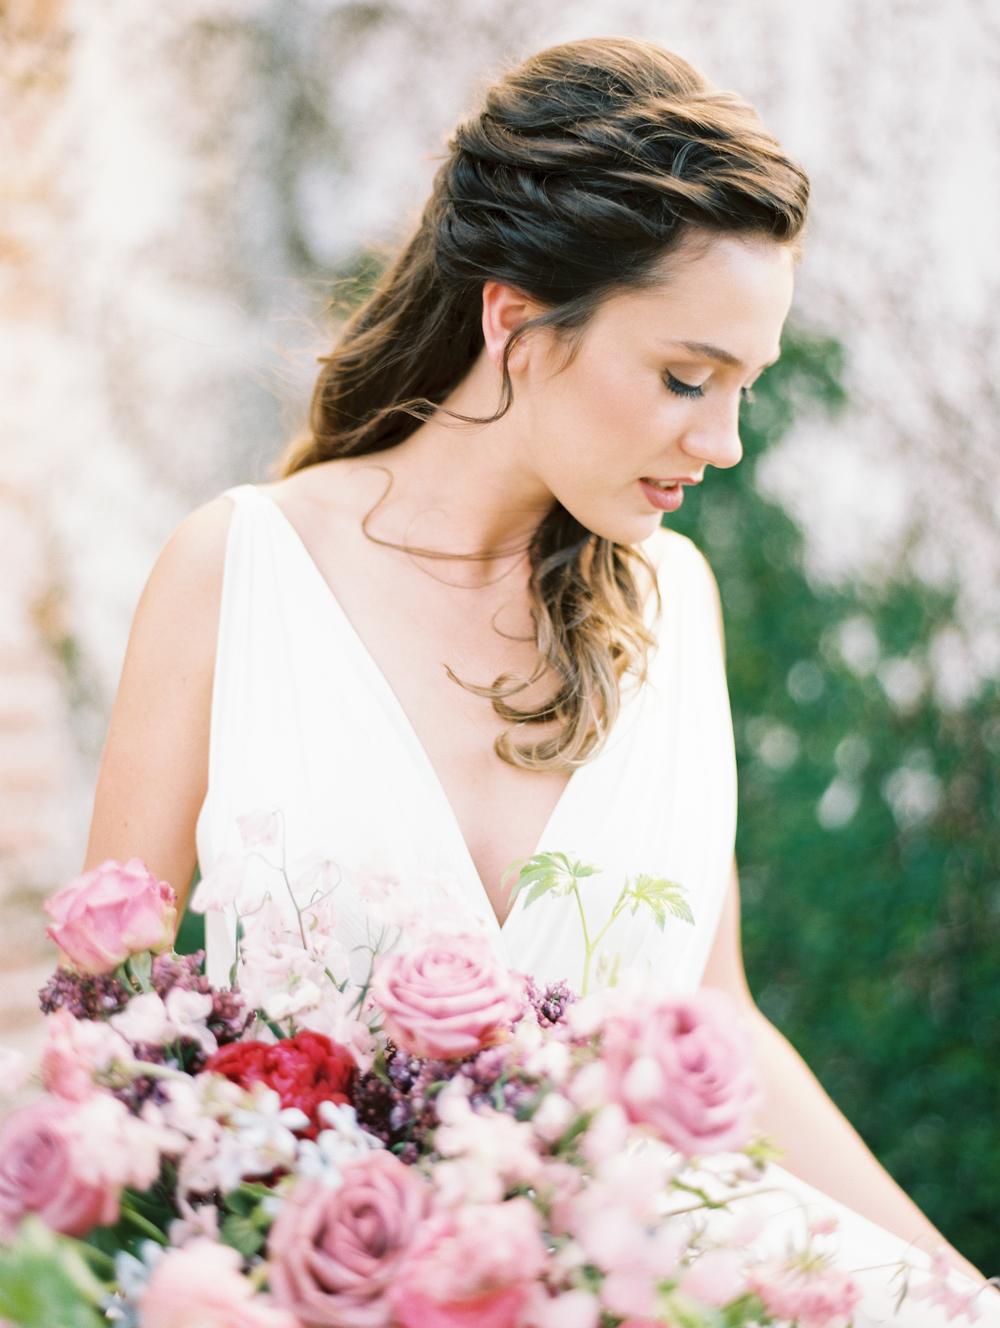 kristin-la-voie-photography-Austin-Wedding-Photographer-44.jpg